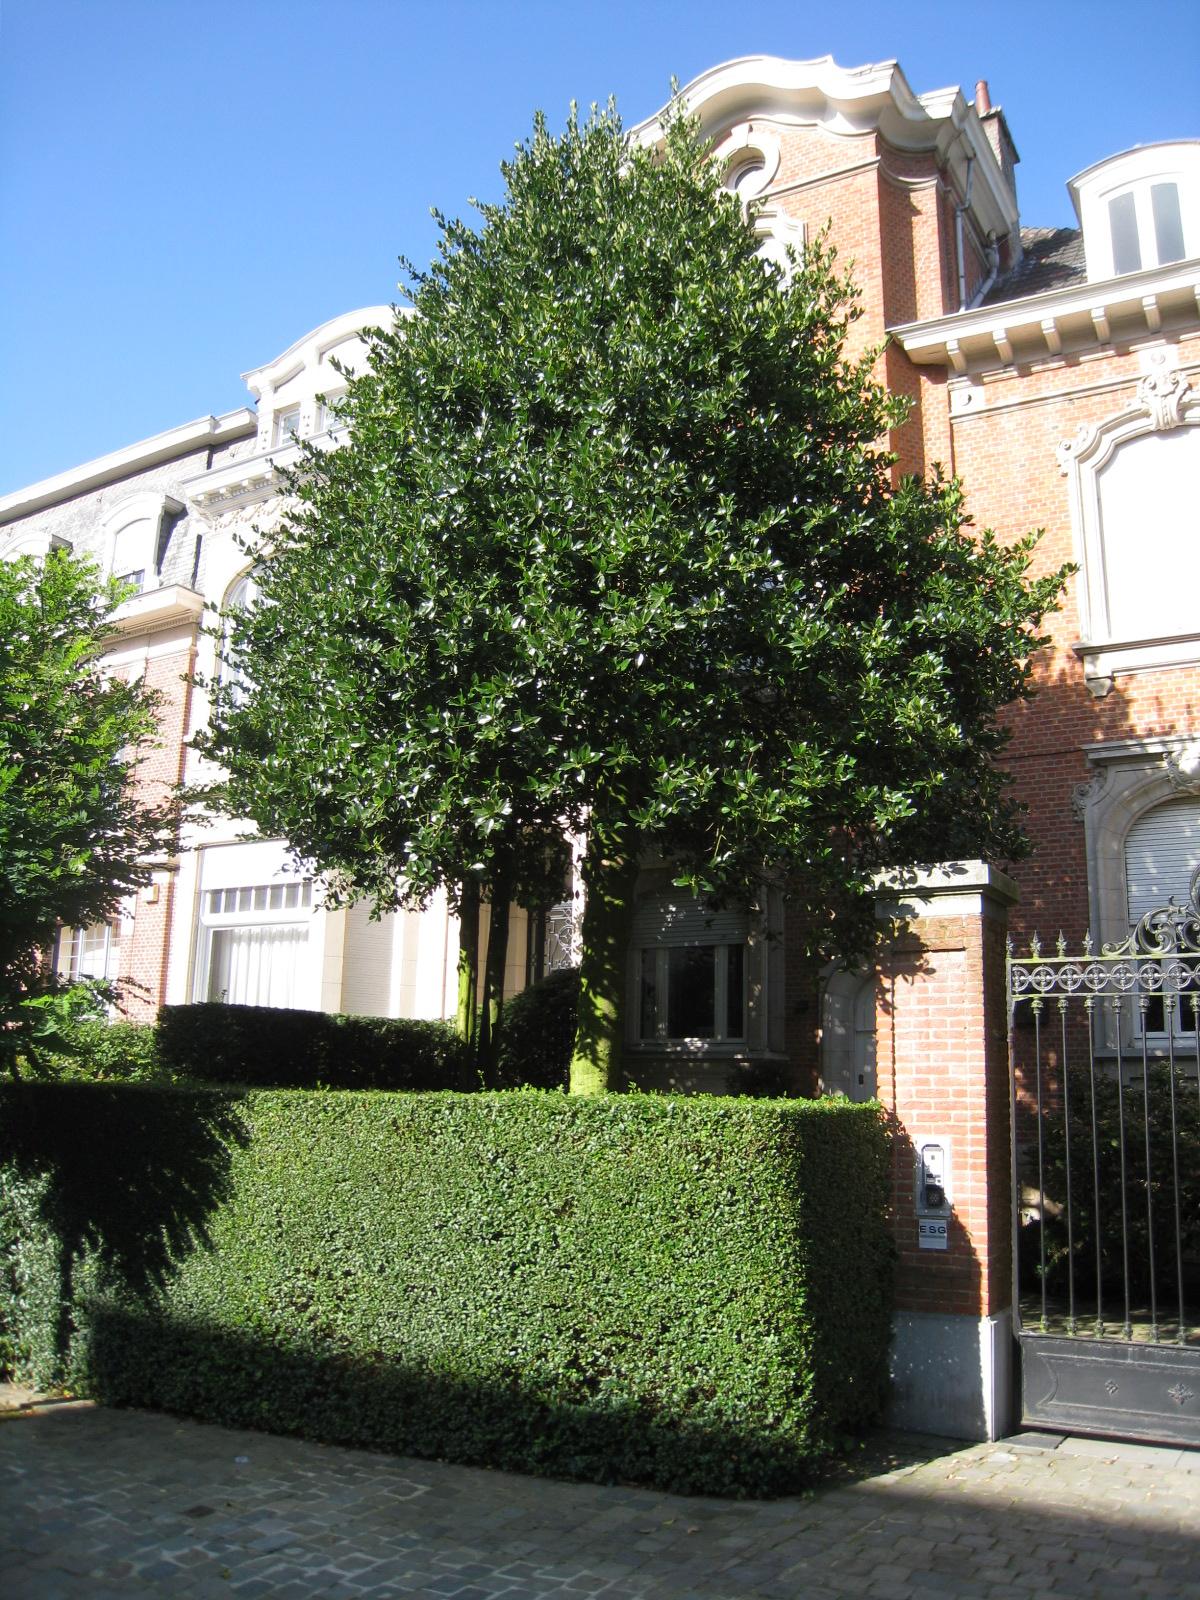 Ilex aquifolium 'Pyramidalis' – Uccle, Avenue Léo Errera, 47 –  20 Août 2010